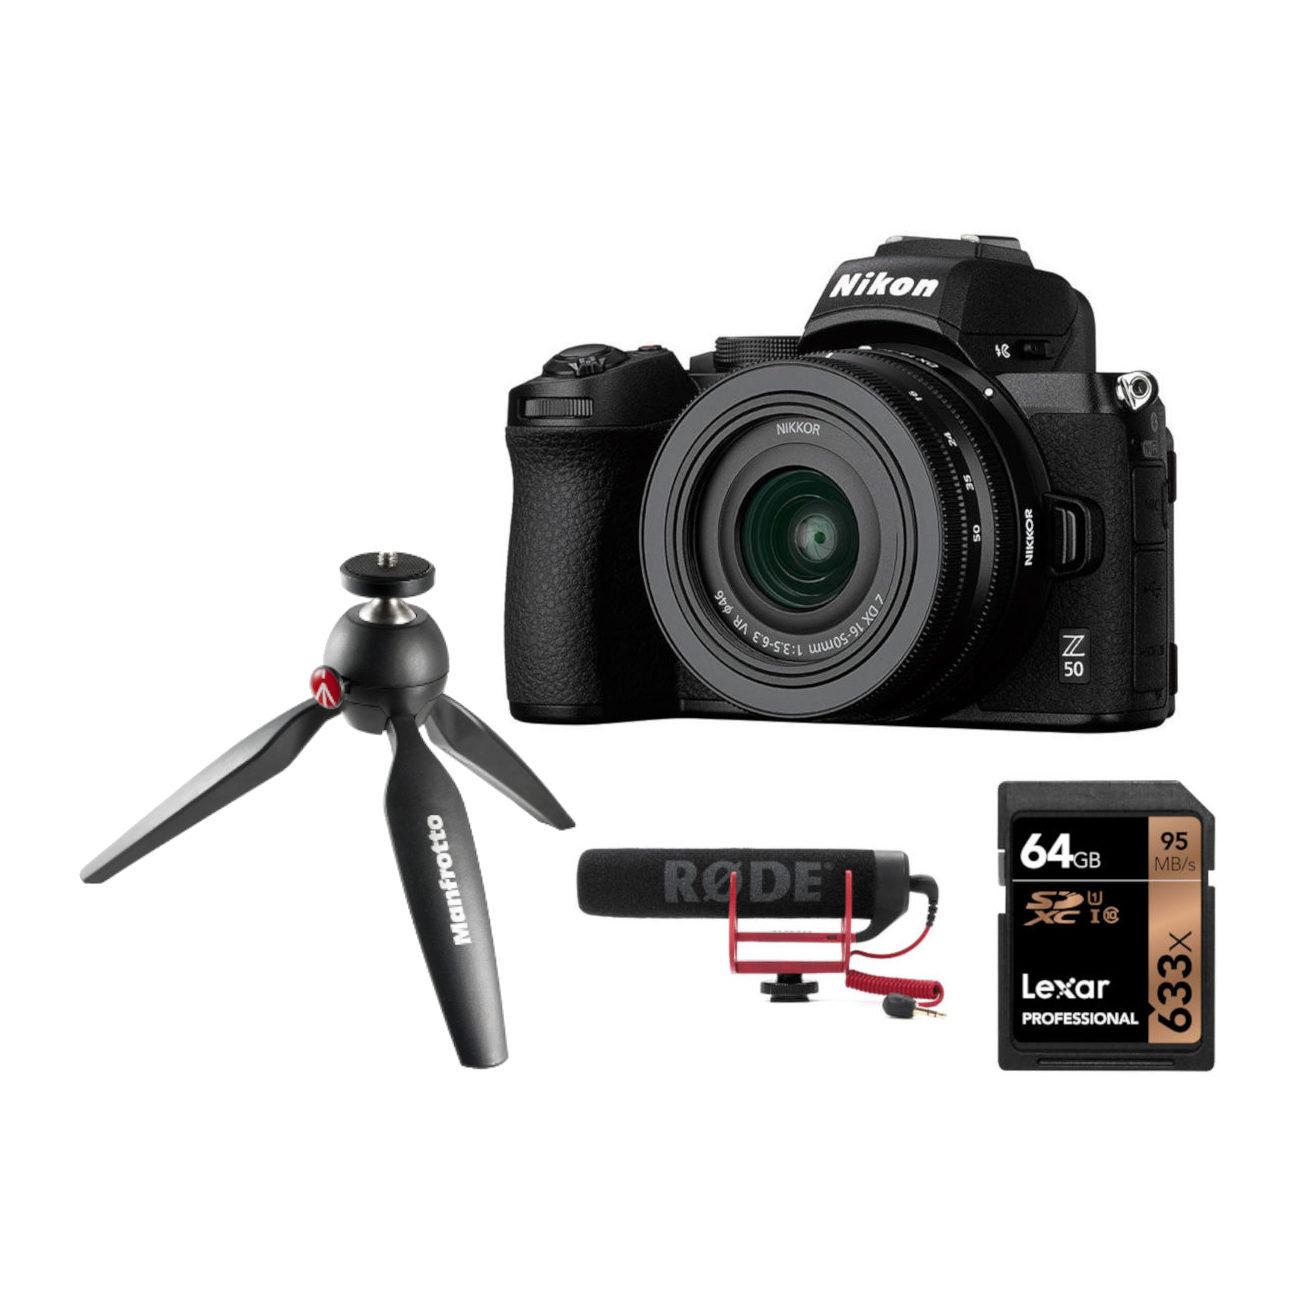 Nikon Z50 systeemcamera + 16-50mm Vlog Kit <br/>€ 1049.00 <br/> <a href='https://www.cameranu.nl/fotografie/?tt=12190_474631_241358_&r=https%3A%2F%2Fwww.cameranu.nl%2Fnl%2Fp3179542%2Fnikon-z50-systeemcamera-16-50mm-vlog-kit%3Fchannable%3De10841.MzE3OTU0Mg%26utm_campaign%3D%26utm_content%3DSysteemcamera%26utm_source%3DTradetracker%26utm_medium%3Dcpc%26utm_term%3DDigitale%2Bcamera%26apos%3Bs' target='_blank'>naar de winkel</a>